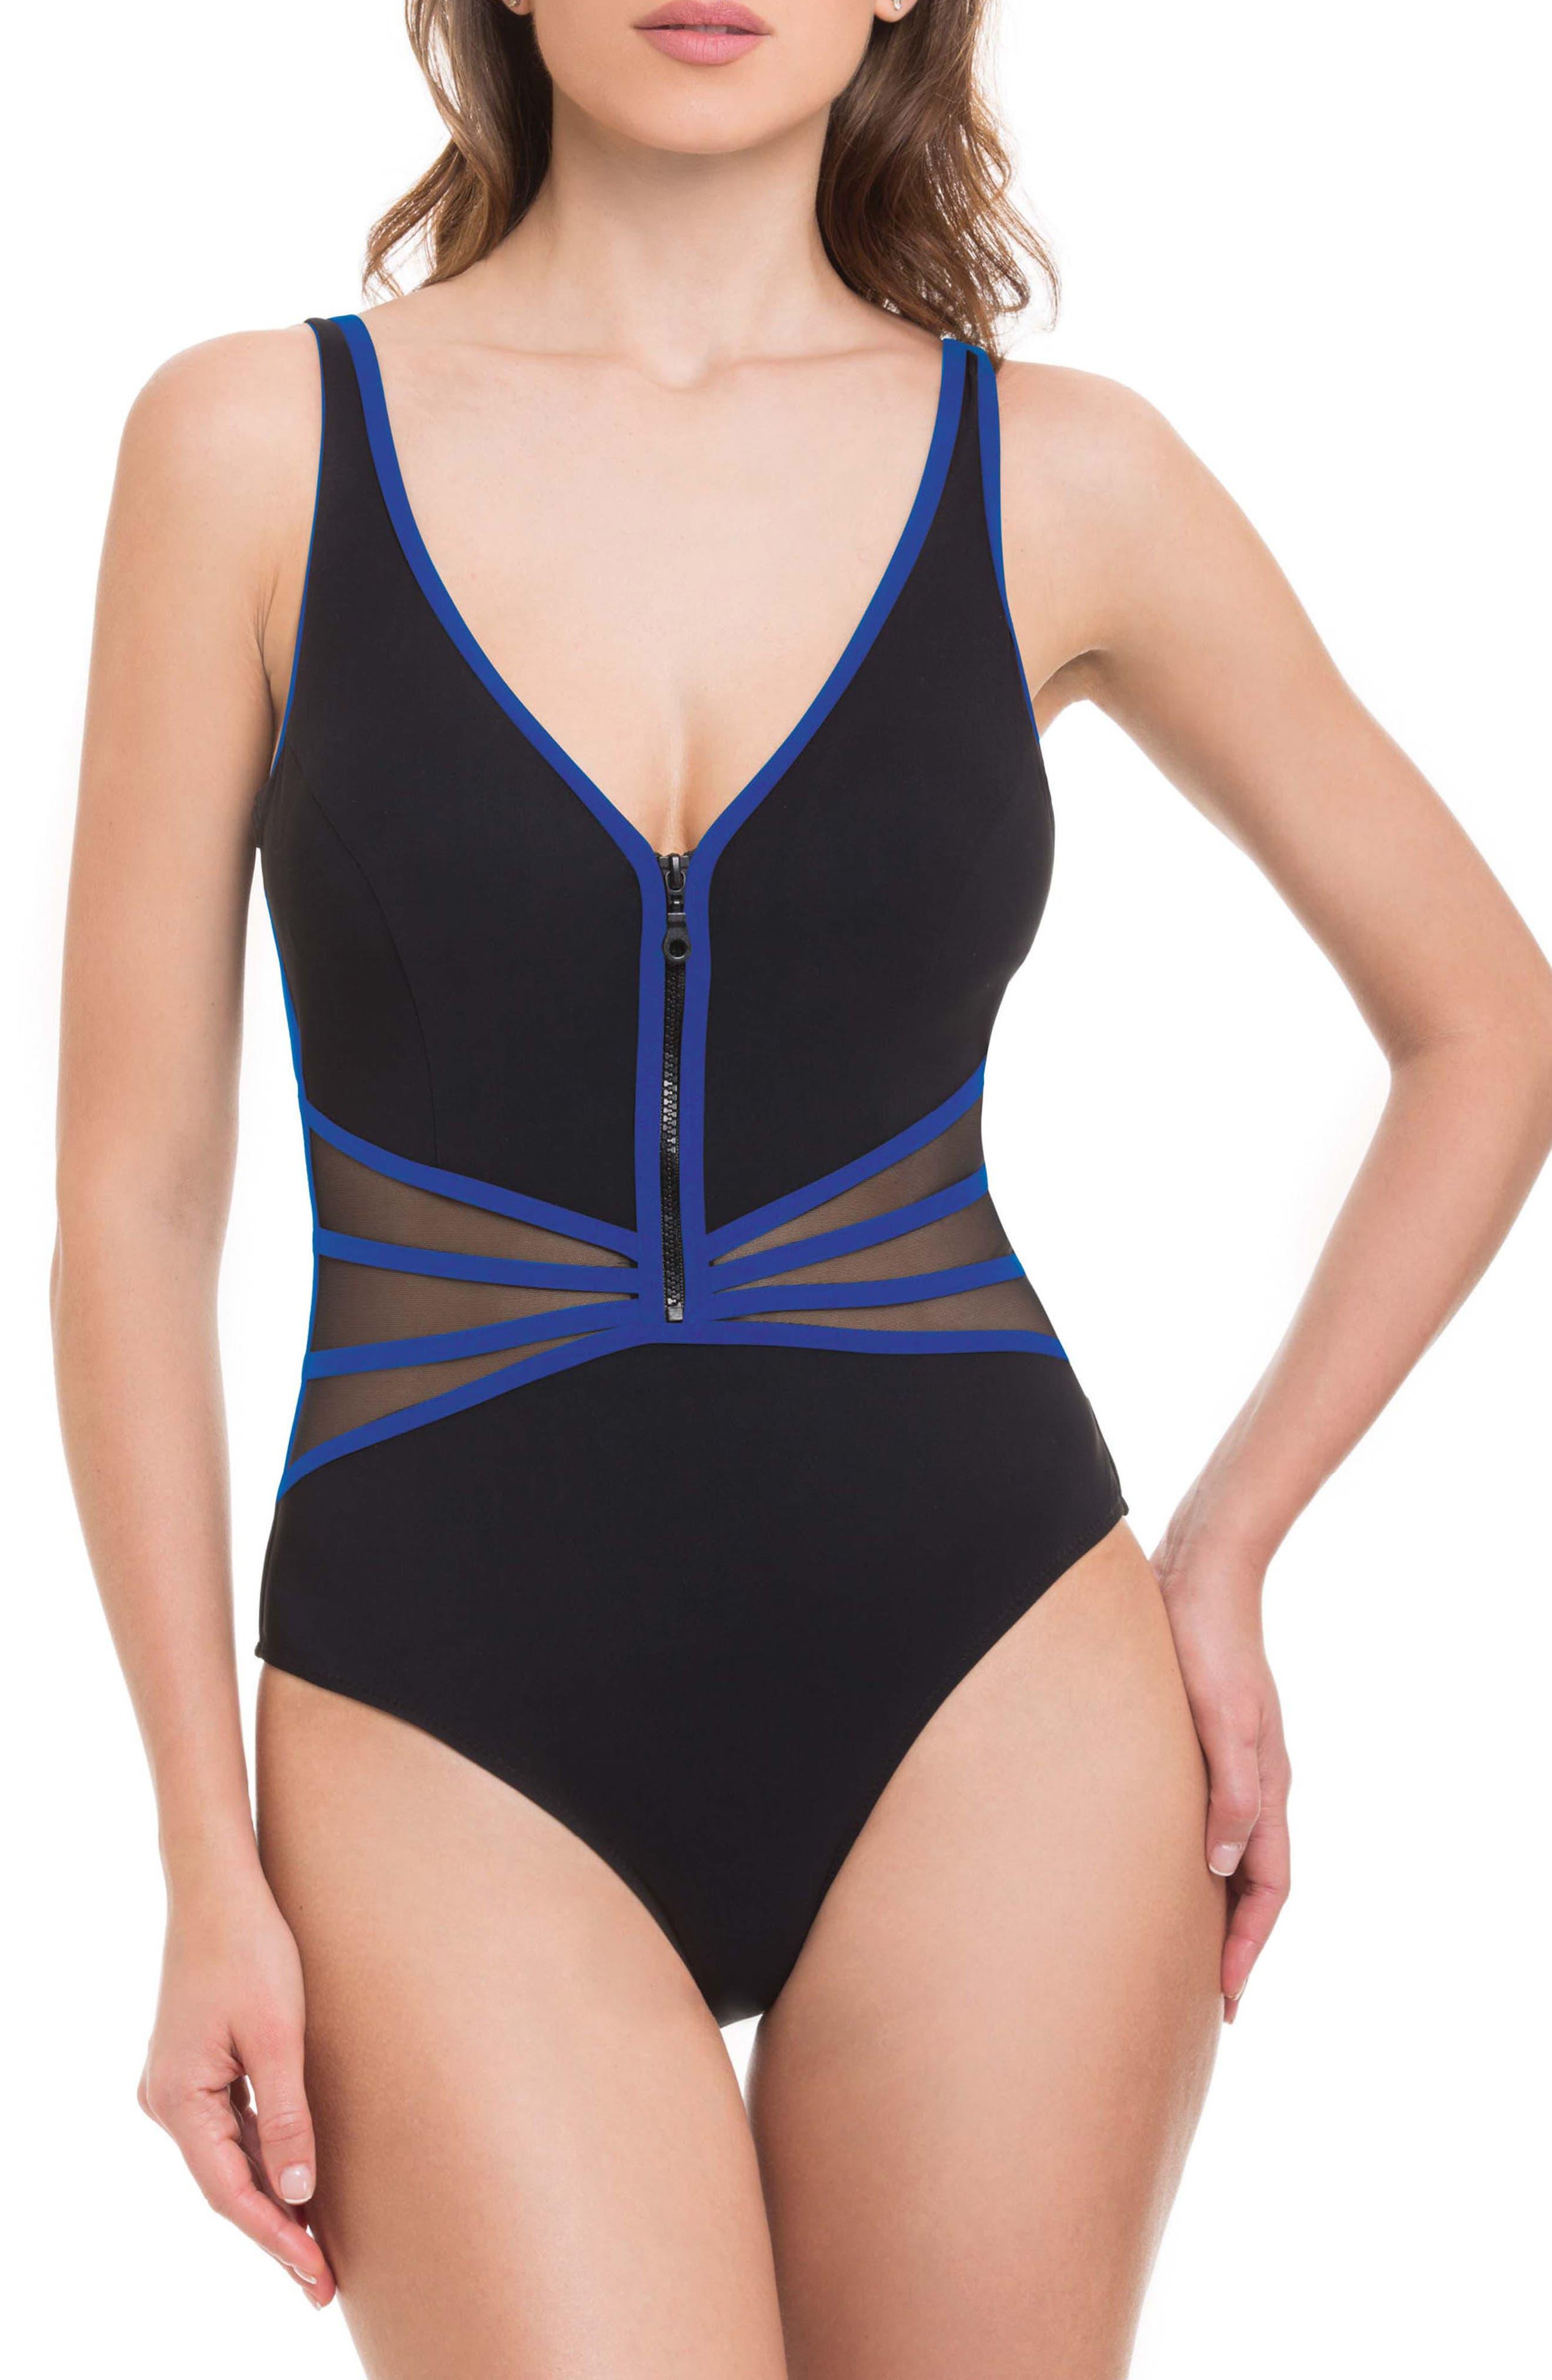 Grand Prix One-Piece Swimsuit,                         Main,                         color, Black/ Blue